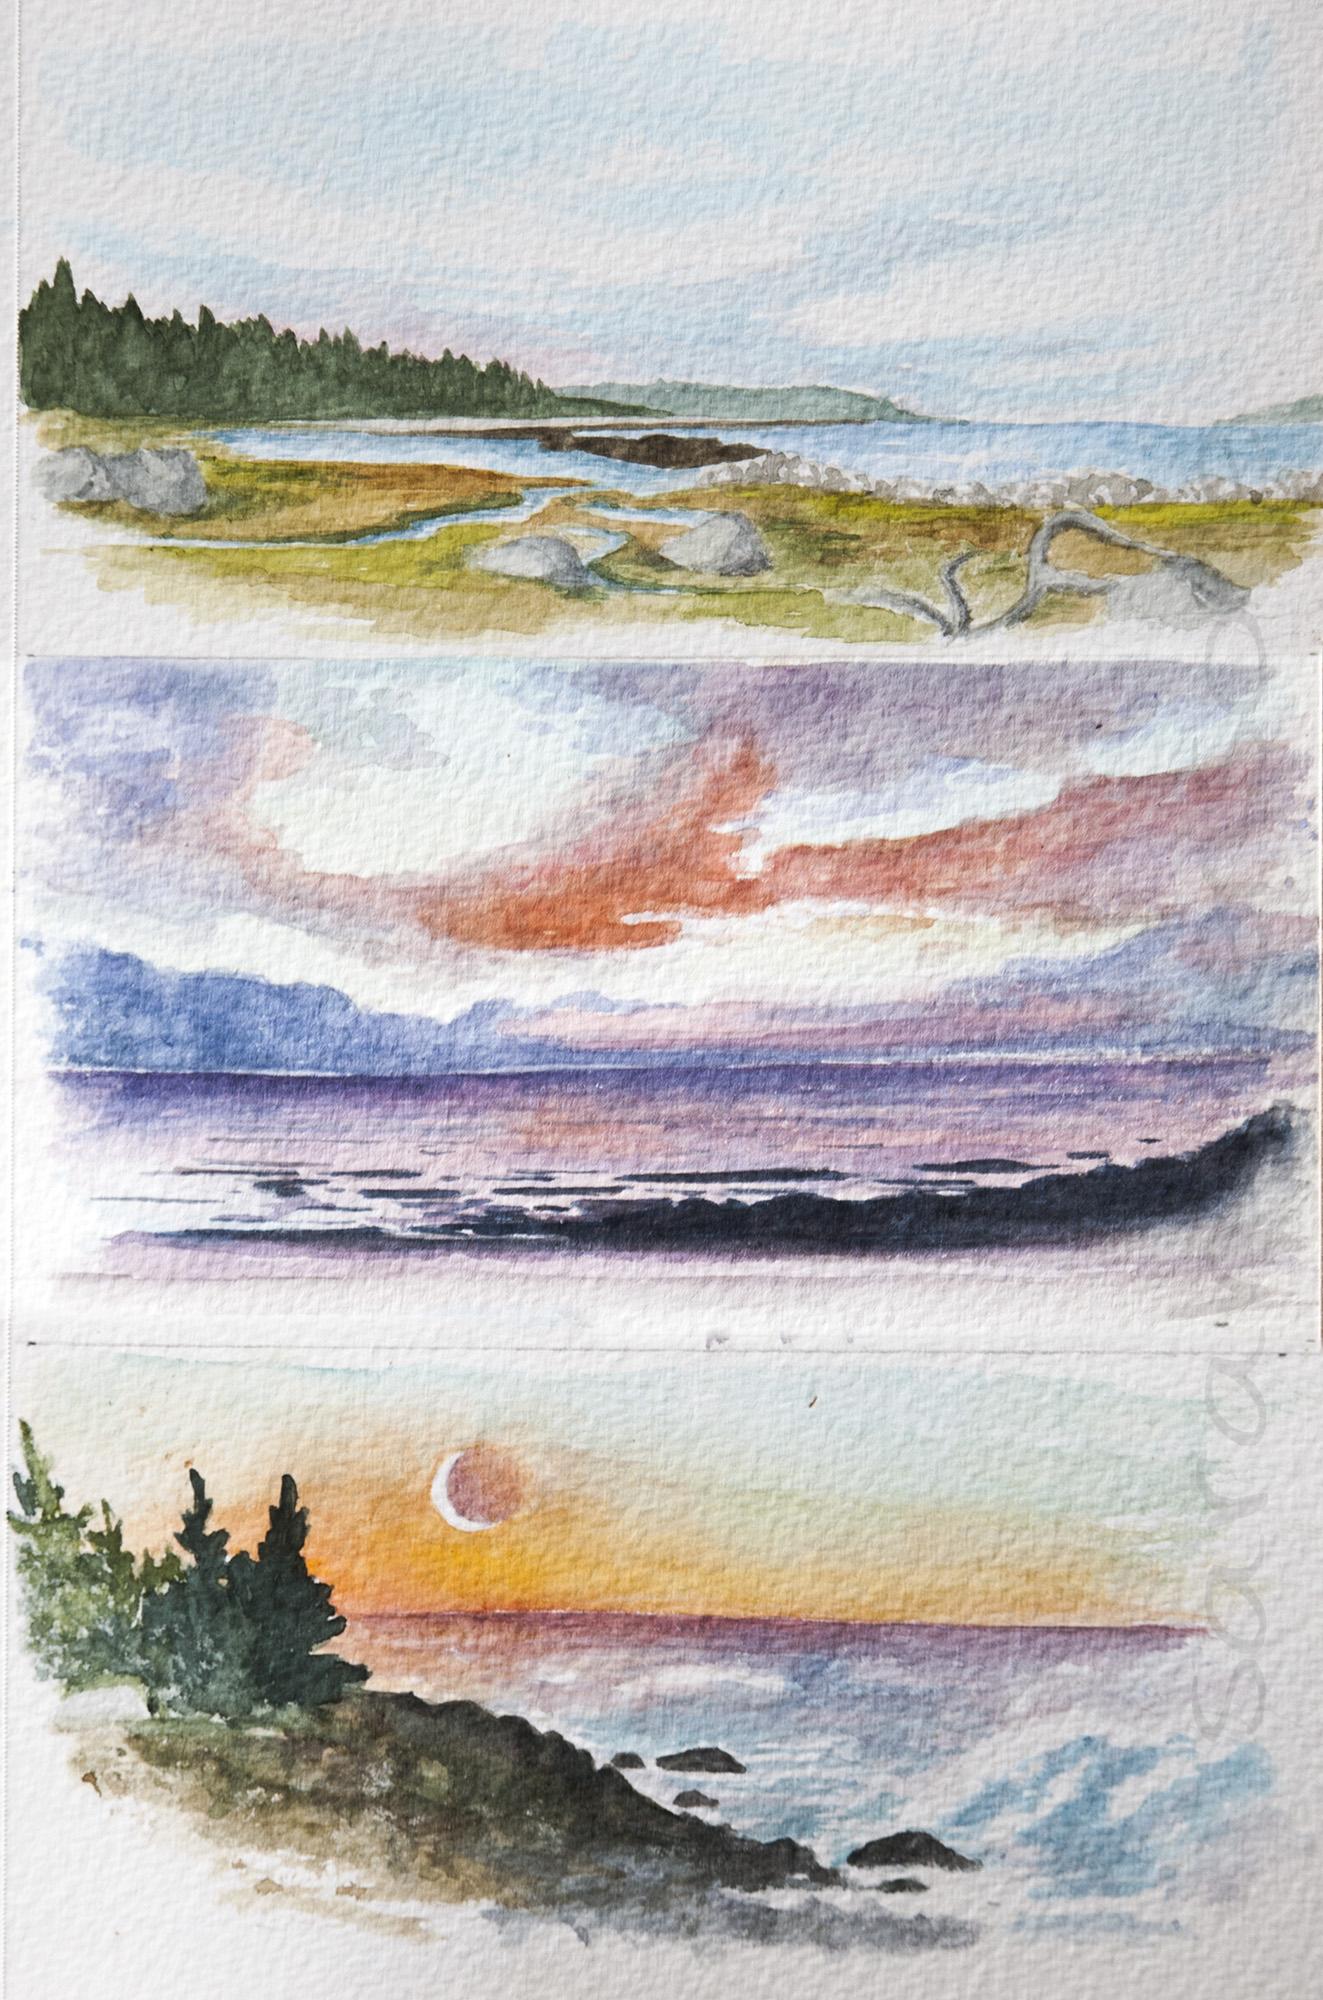 Seal Island Scenes